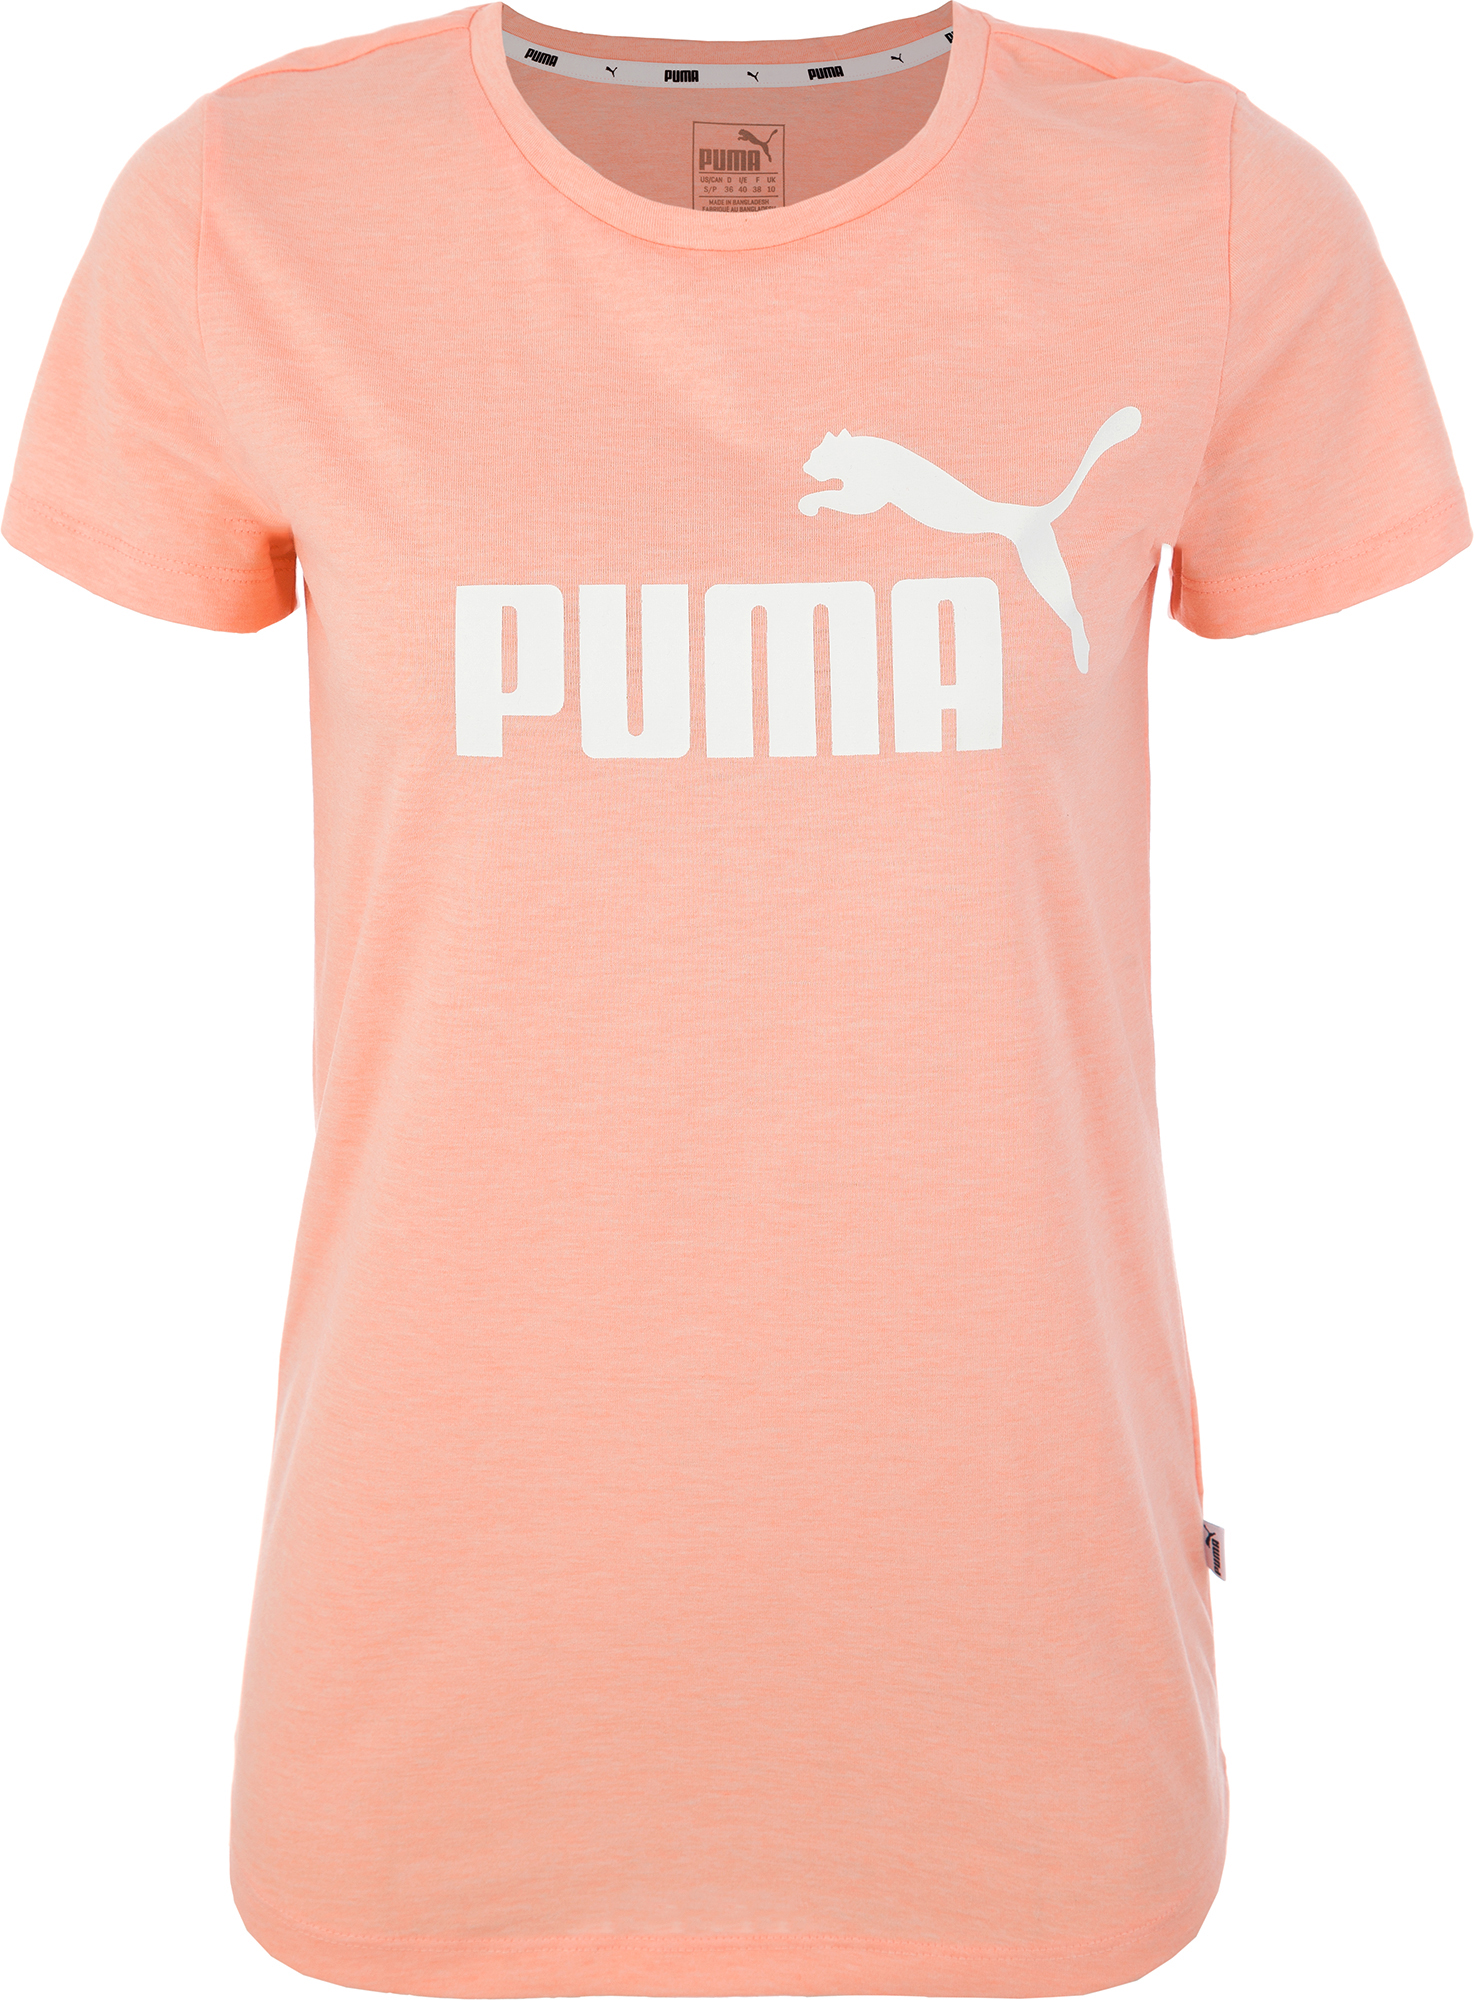 Puma Футболка женская Puma ESS+ Logo Heather Tee, размер 48-50